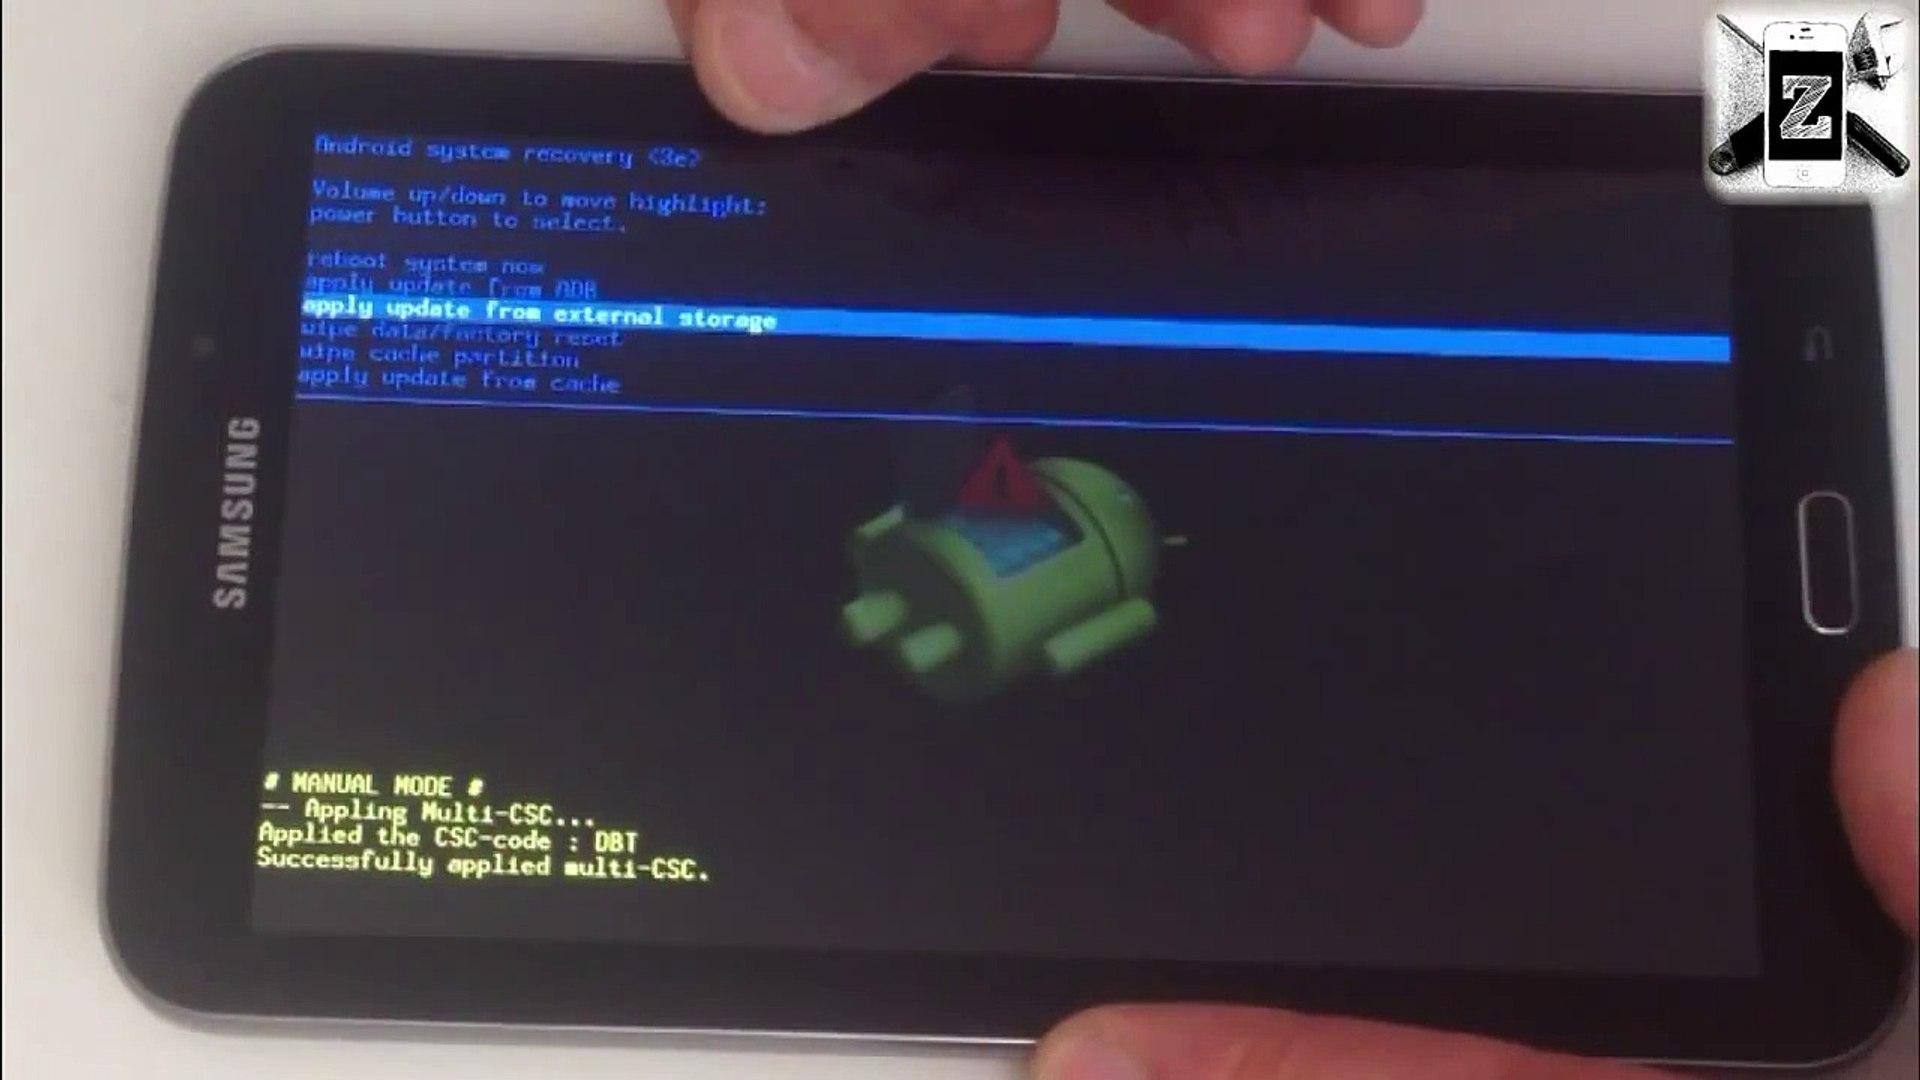 Samsung GALAXY Tab 3 7 0 - Screen Lock, Unlock Password, Factory Reset,  Hard Reset - Easy unlocking